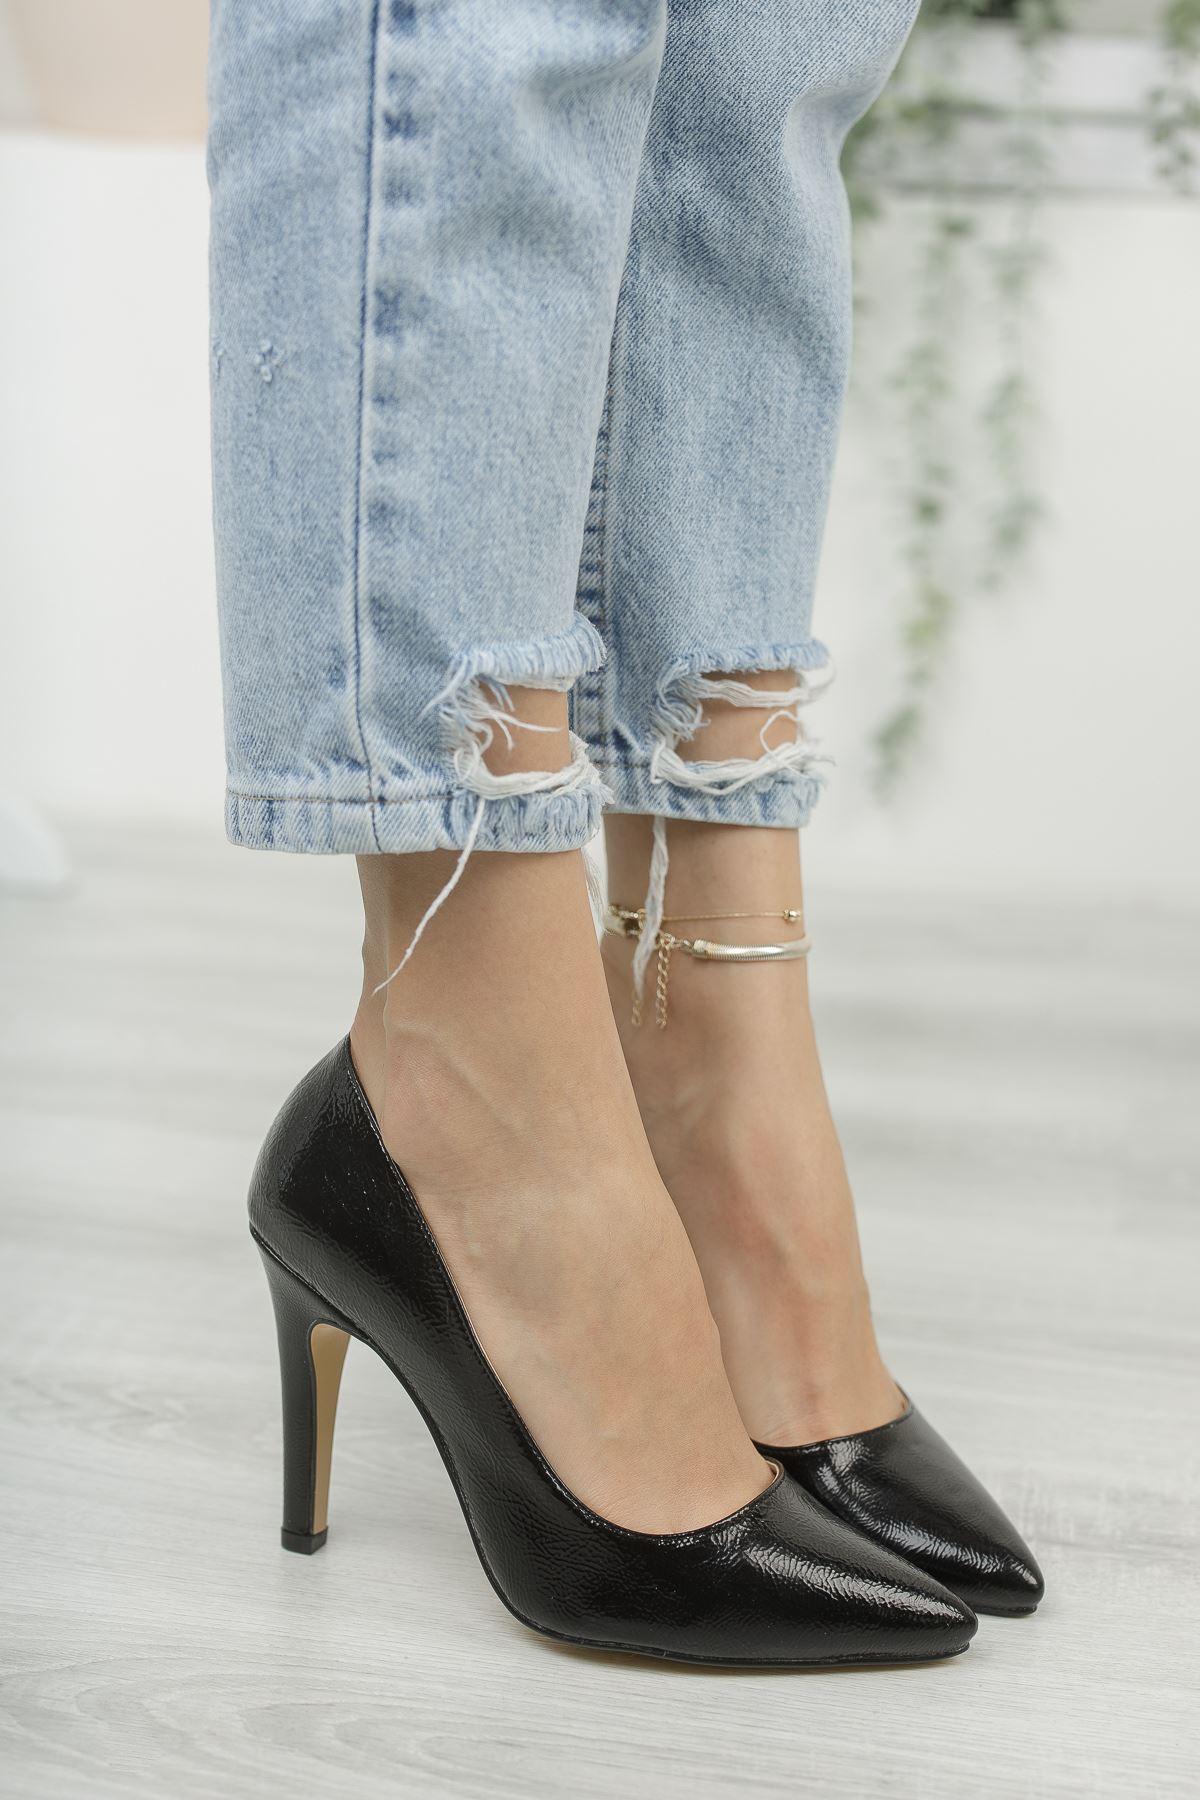 Mariam Siyah Kırışık Rugan Yüksek Topuklu Stiletto